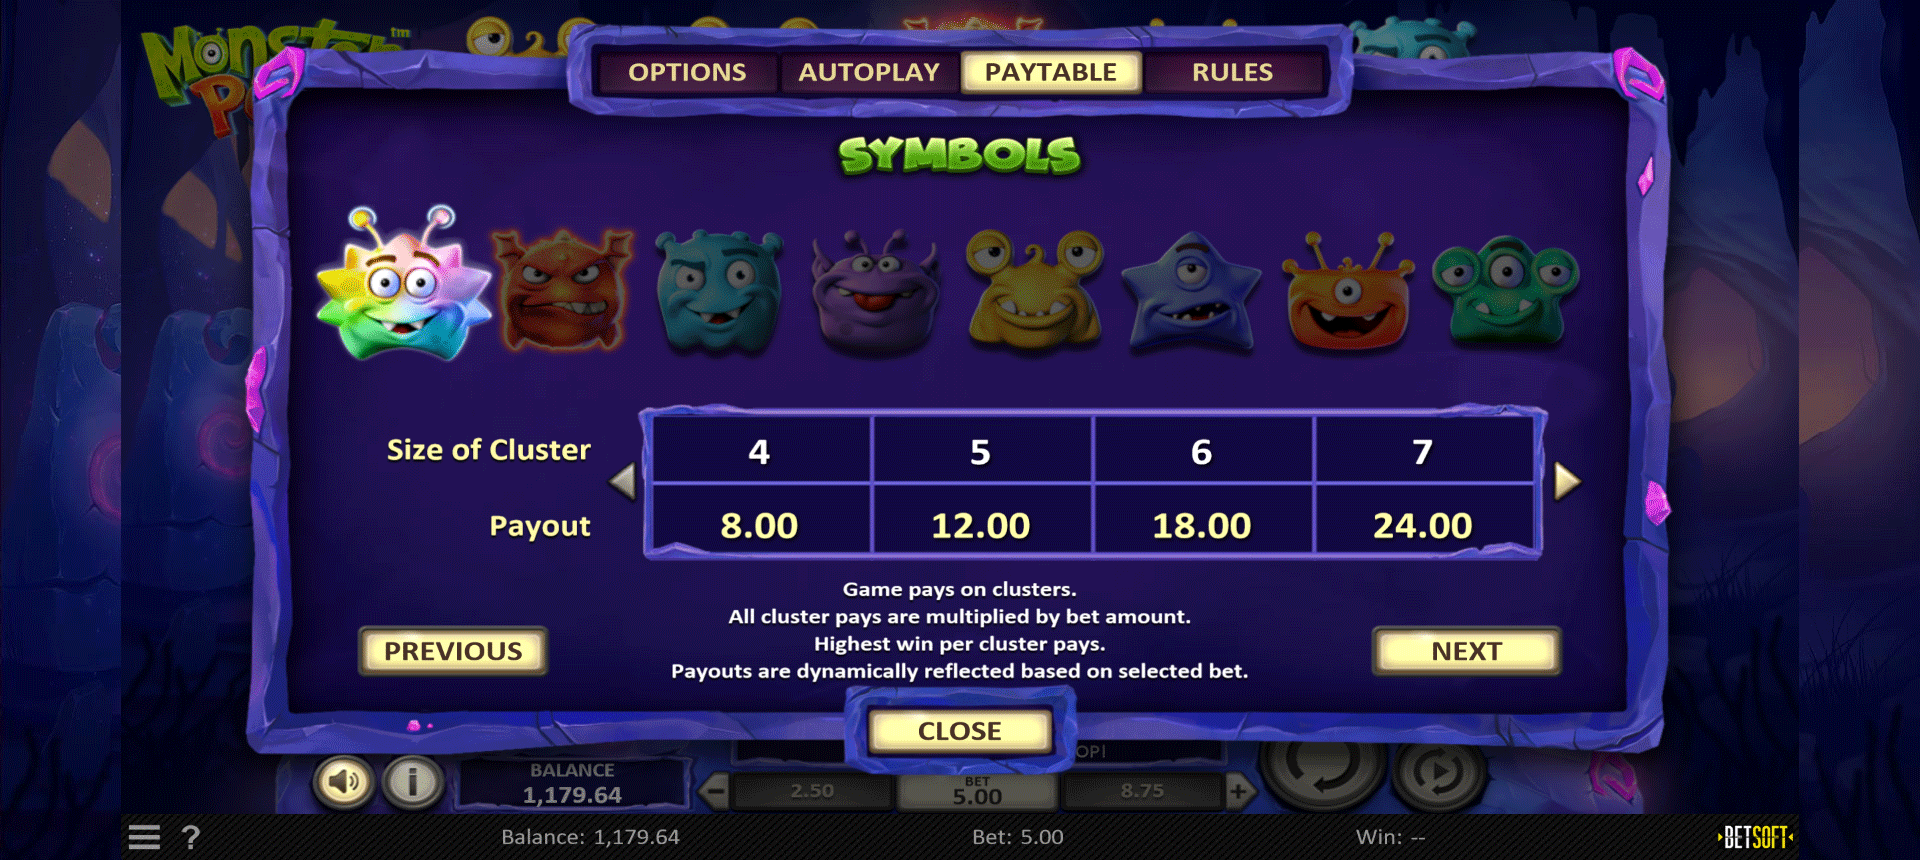 paytable della slot machine monster pop